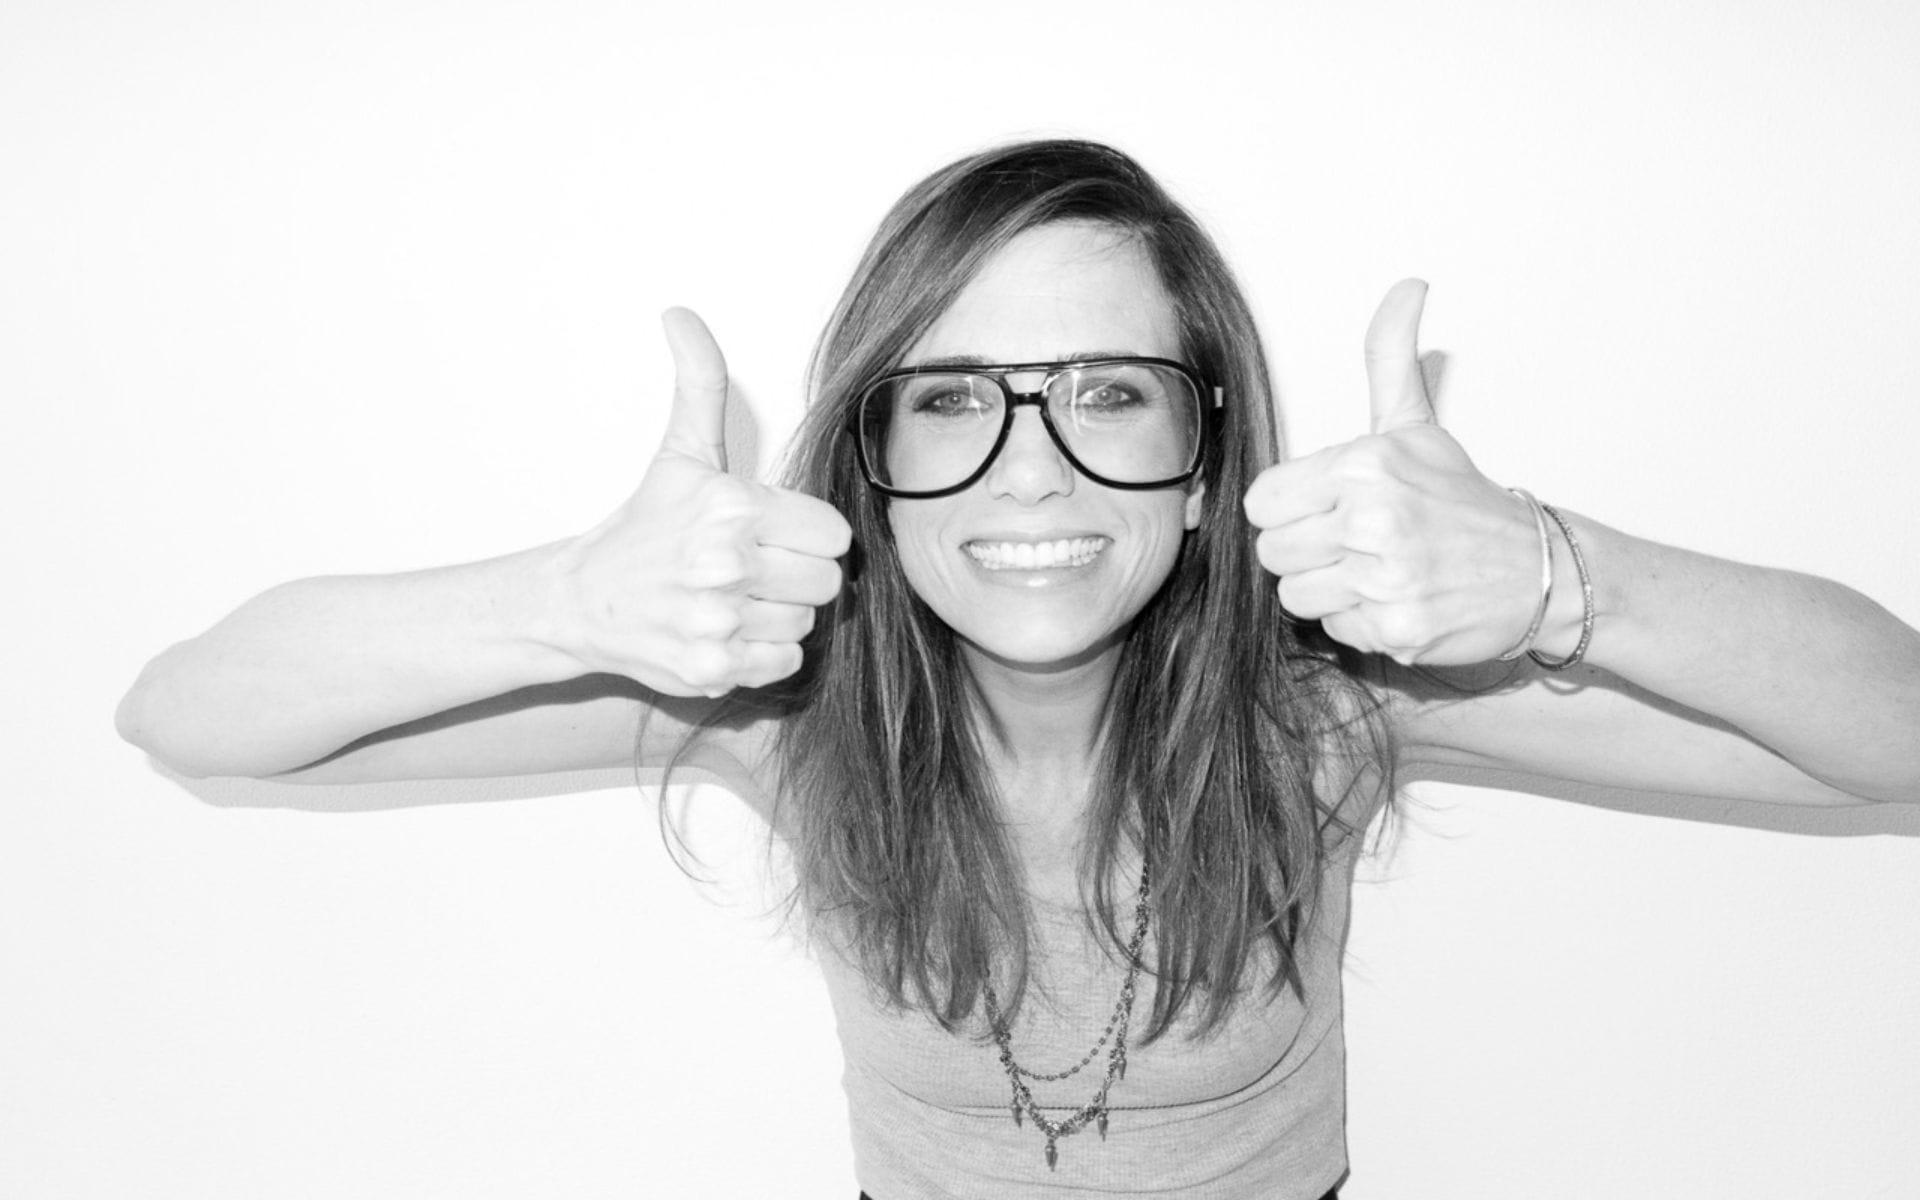 Kristen Wiig Free